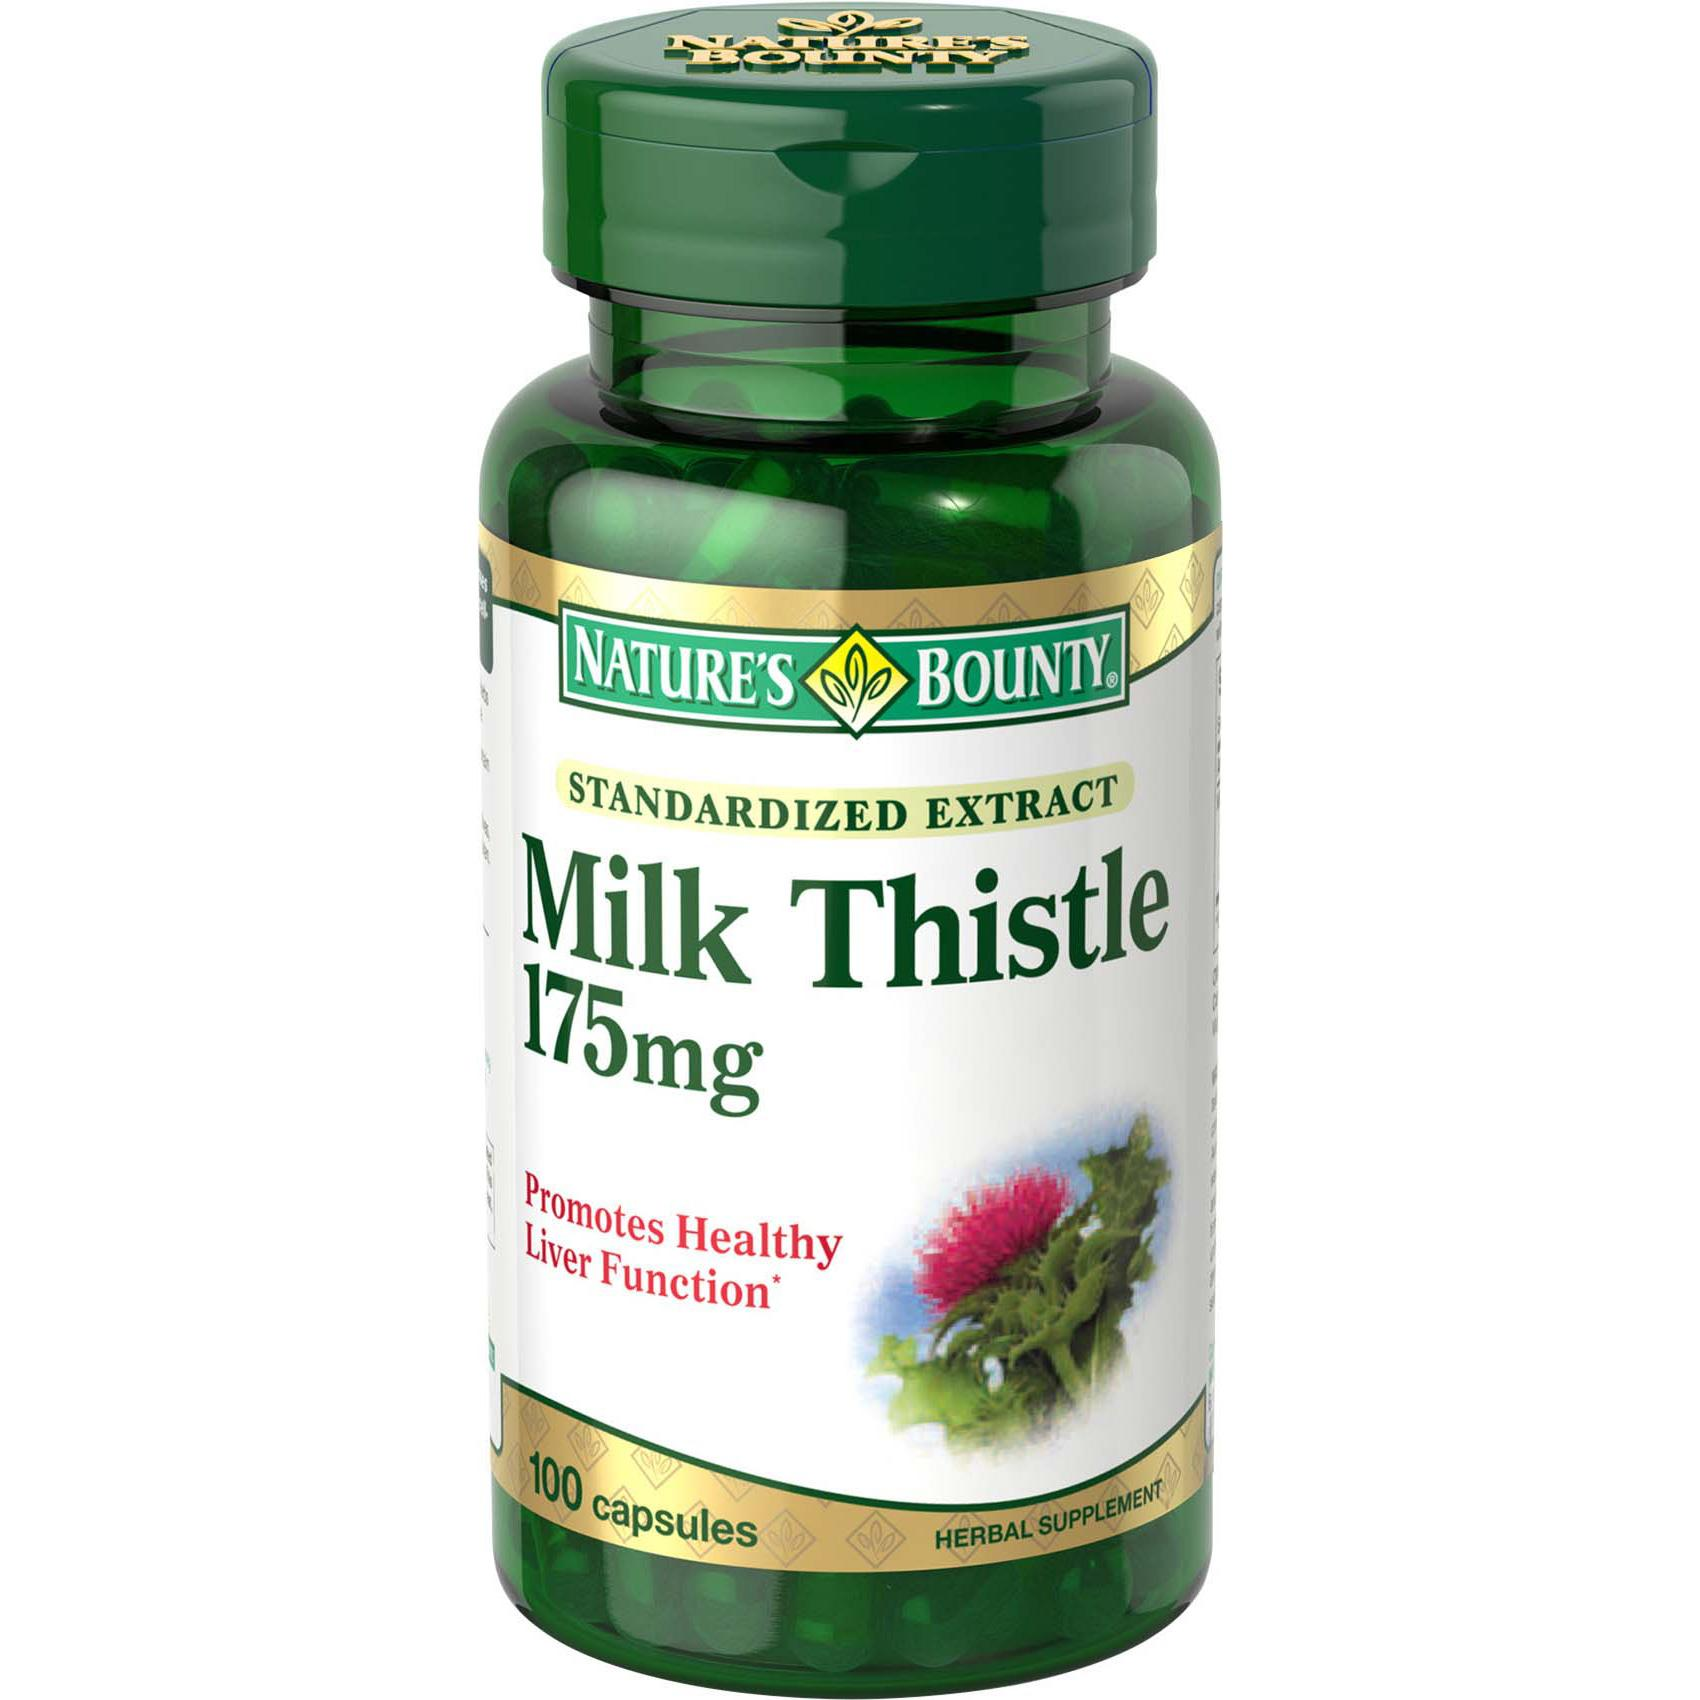 bounty thistle milk nature natures amazon caplets liver silymarin